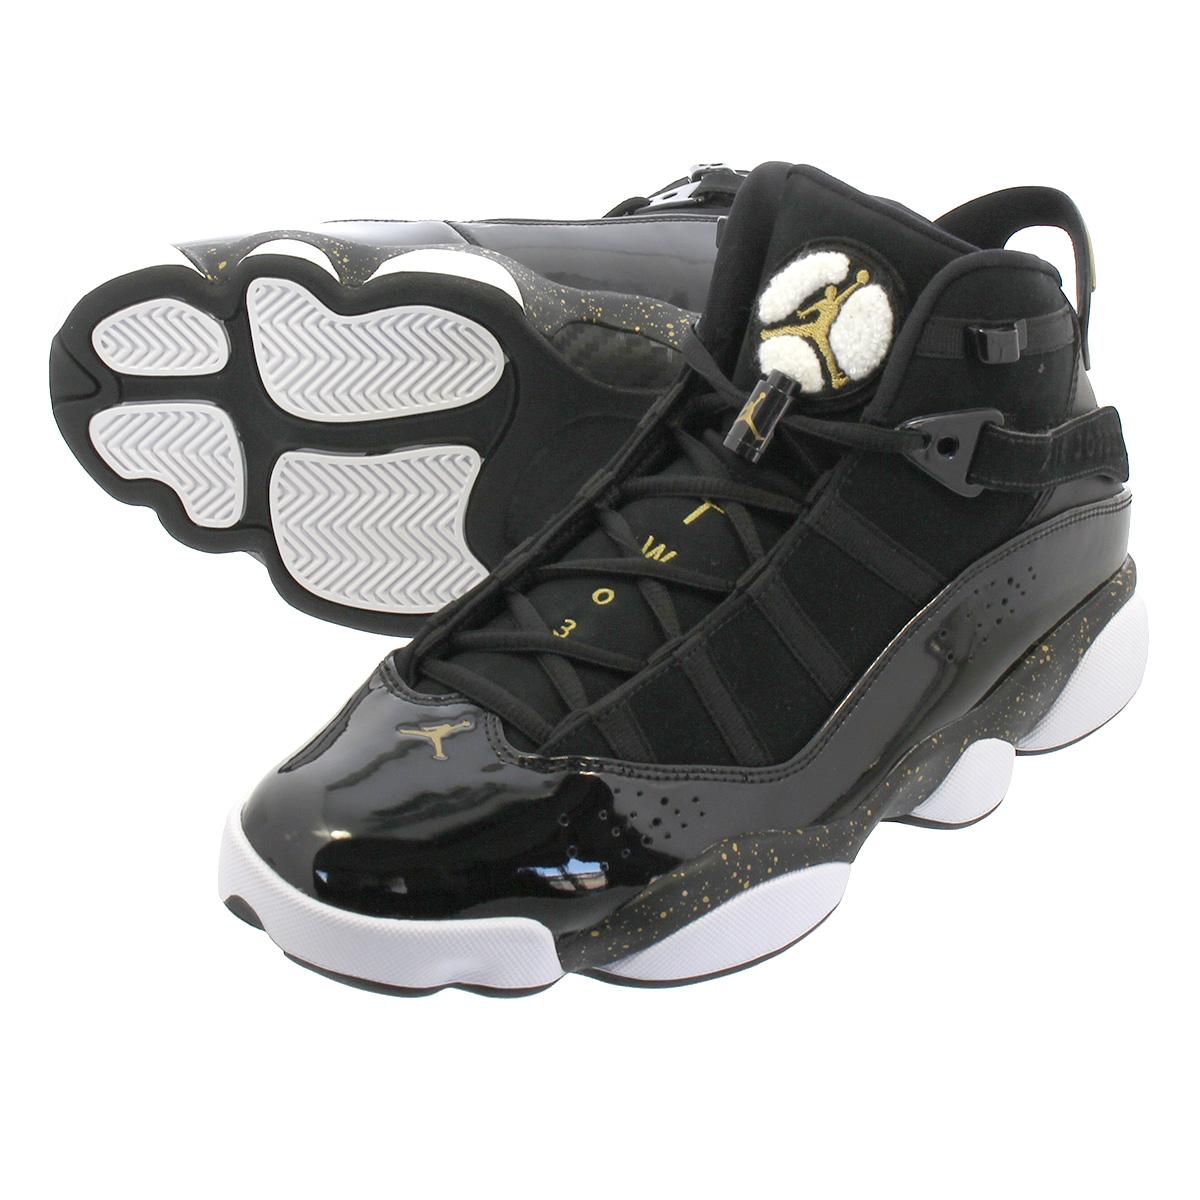 363abe9521f LOWTEX PLUS: NIKE JORDAN 6 RINGS Nike Jordan 6 RINGS Co.,Ltd.  BLACK/METALLIC GOLD/WHITE 322,992-007 | Rakuten Global Market